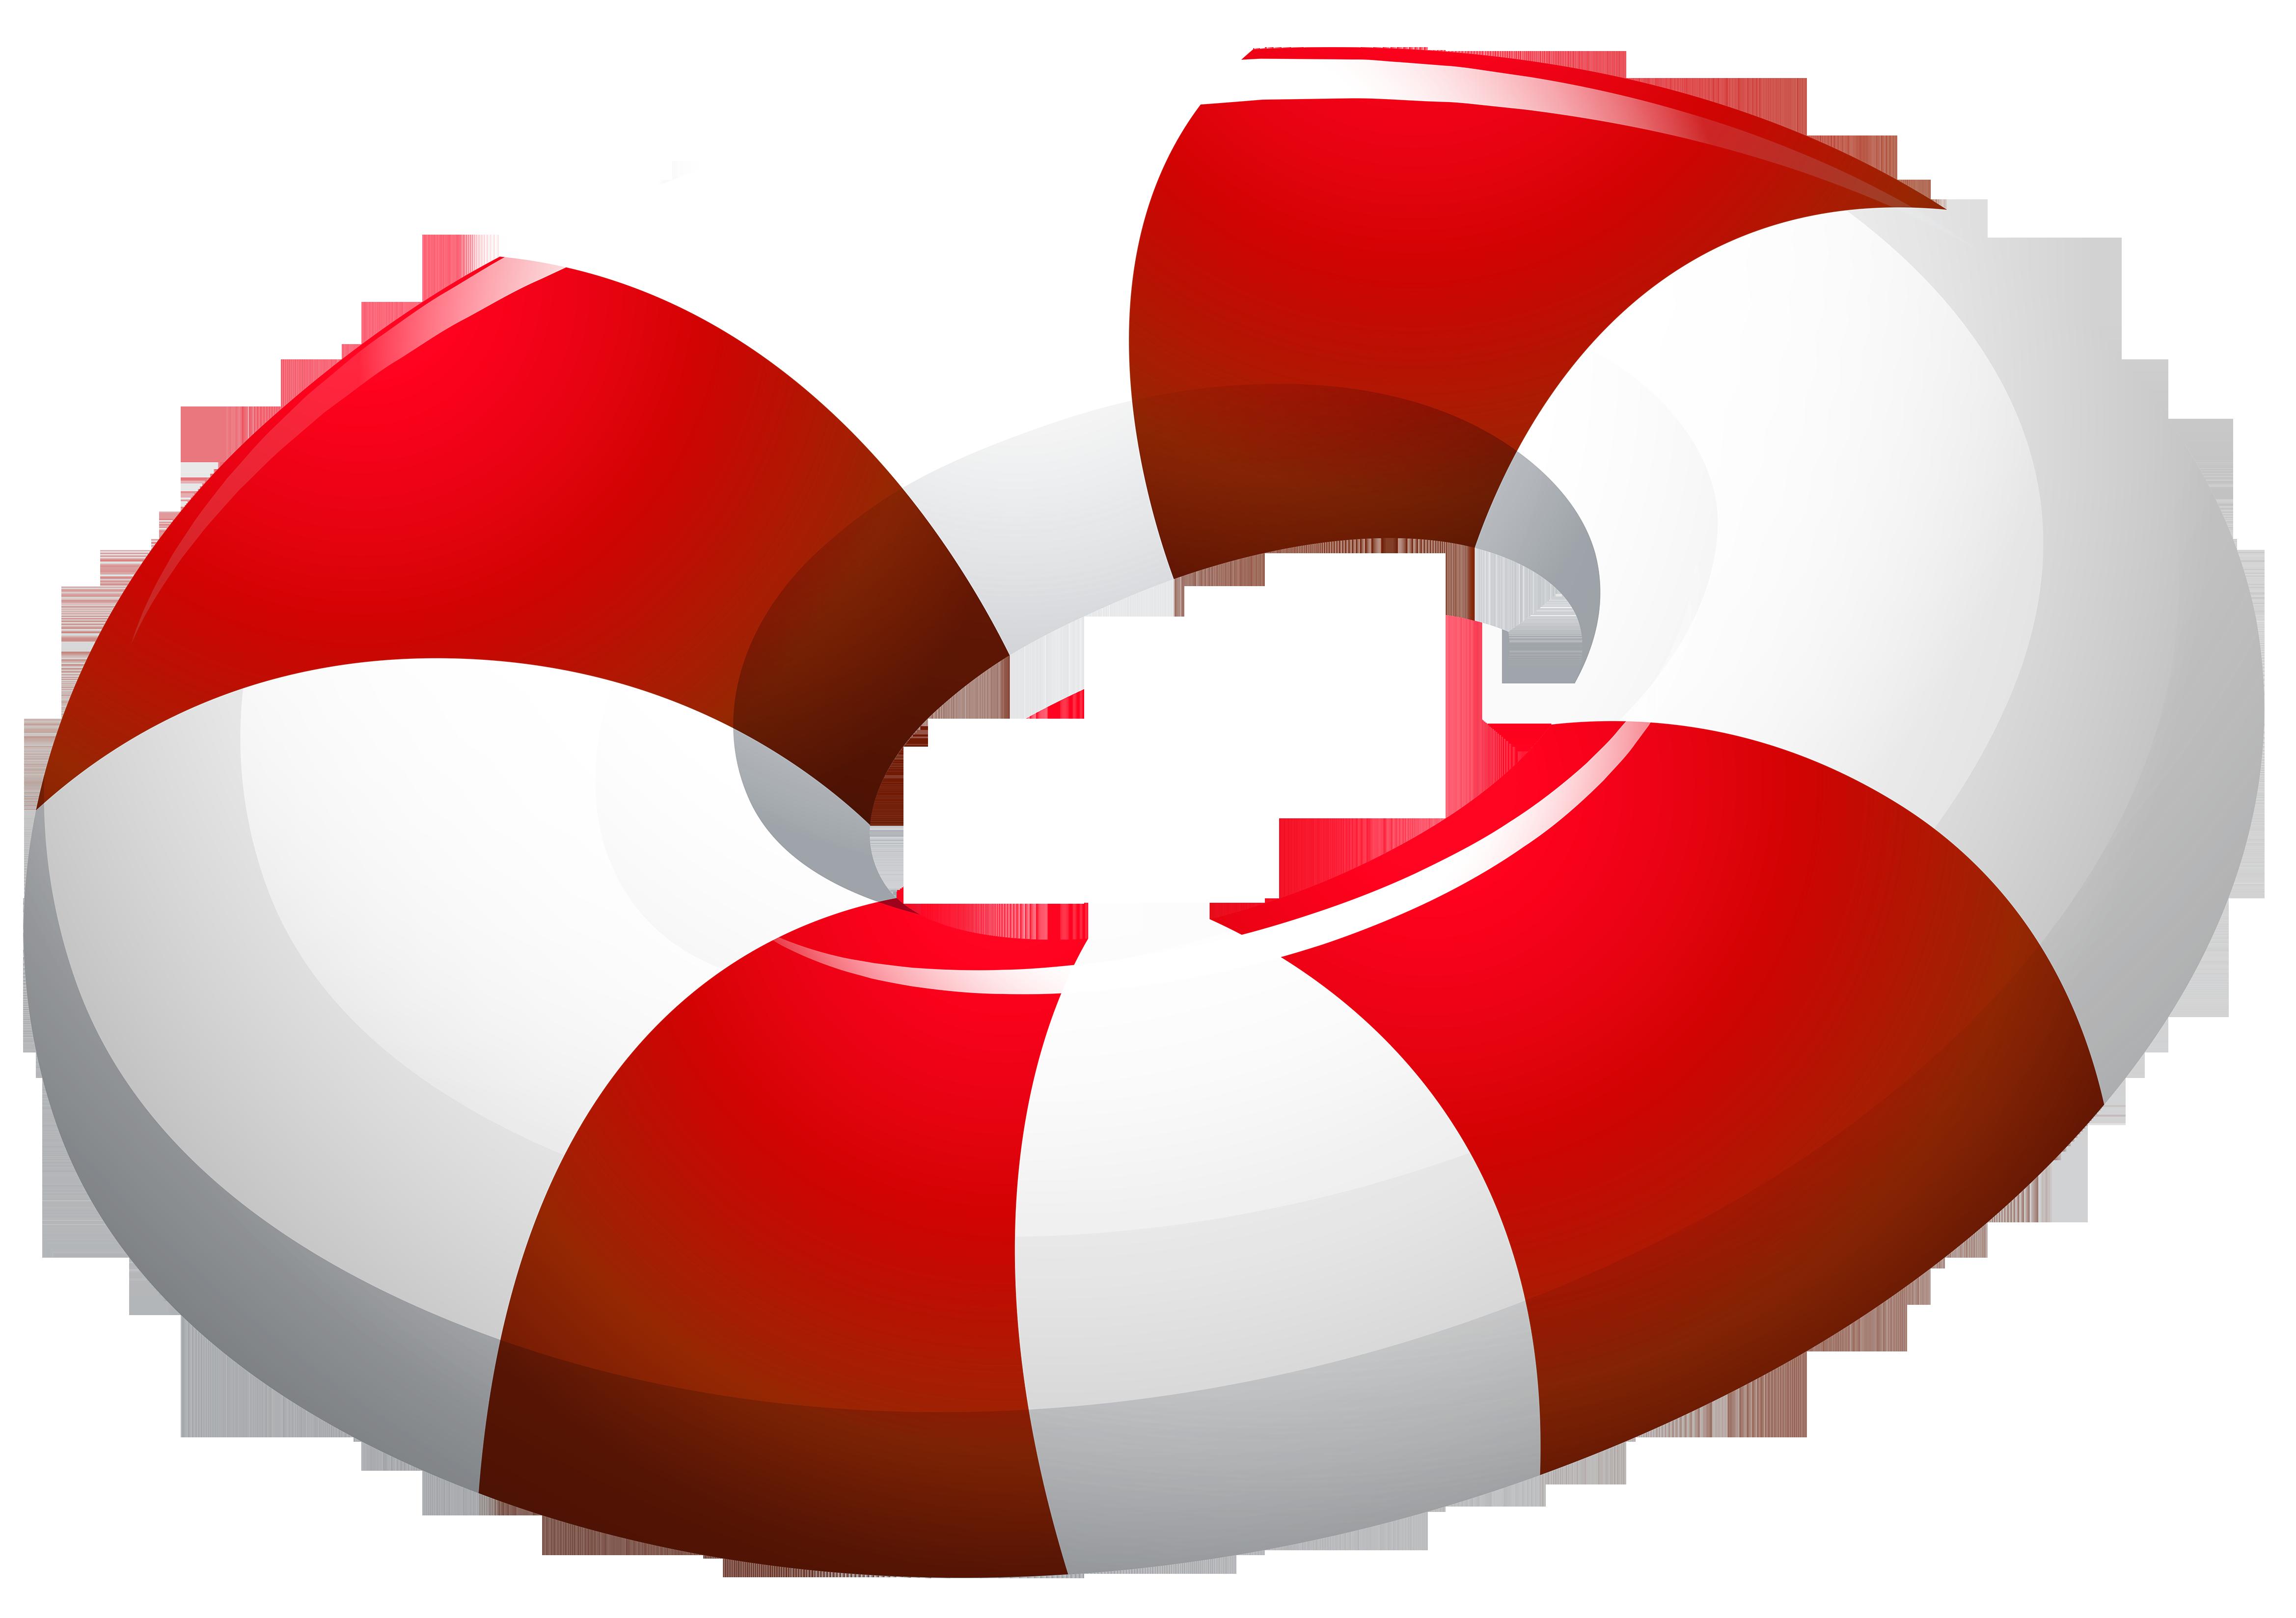 clipart free Swim ring Swimming float Clip art